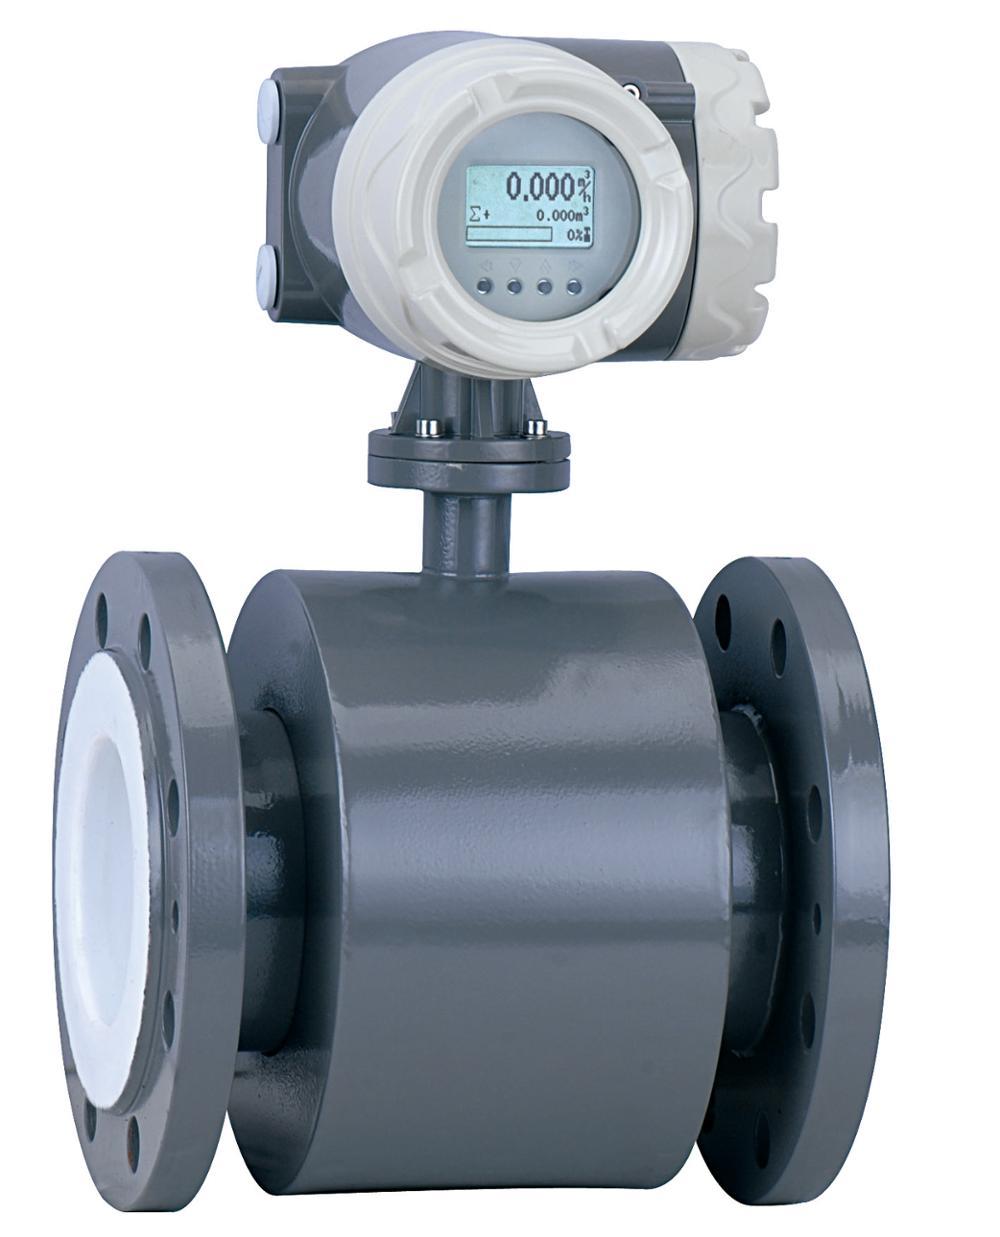 Electronic fuel steam co2 o2 beer vacuum magnetic sensors sensors digital transmitter flow meter flowmeter